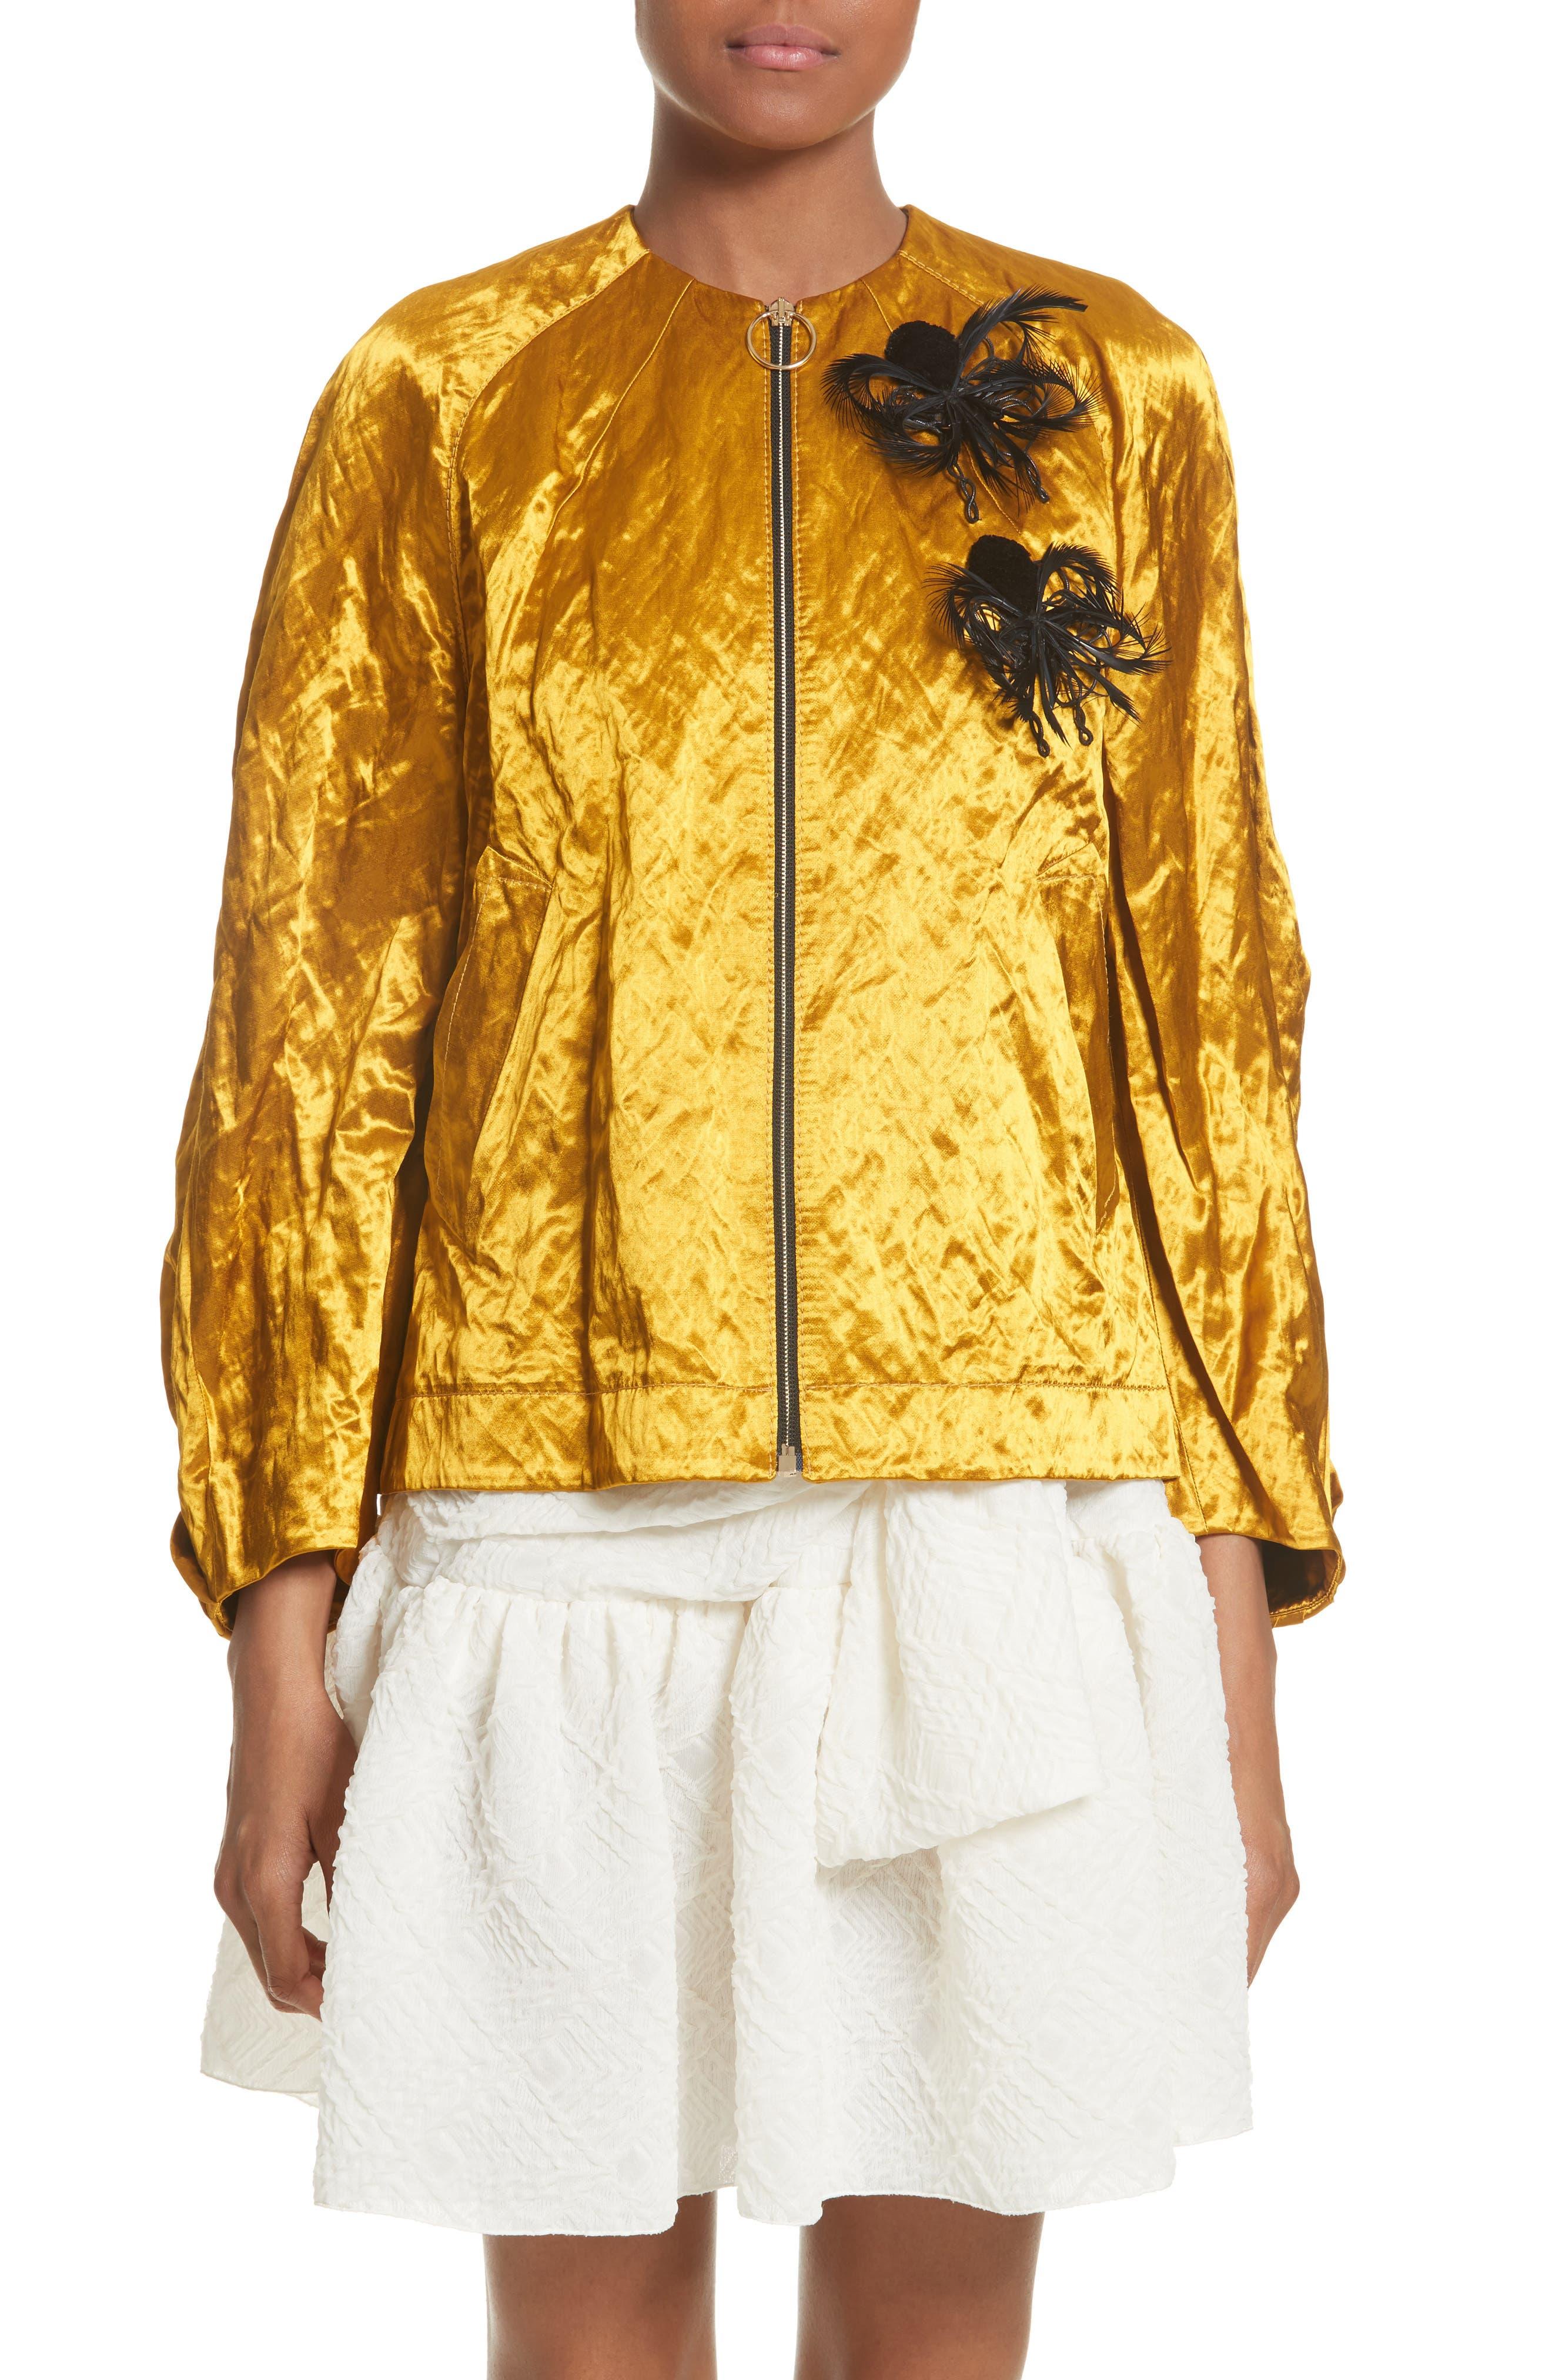 Alternate Image 1 Selected - Roksanda Kengo Jacket